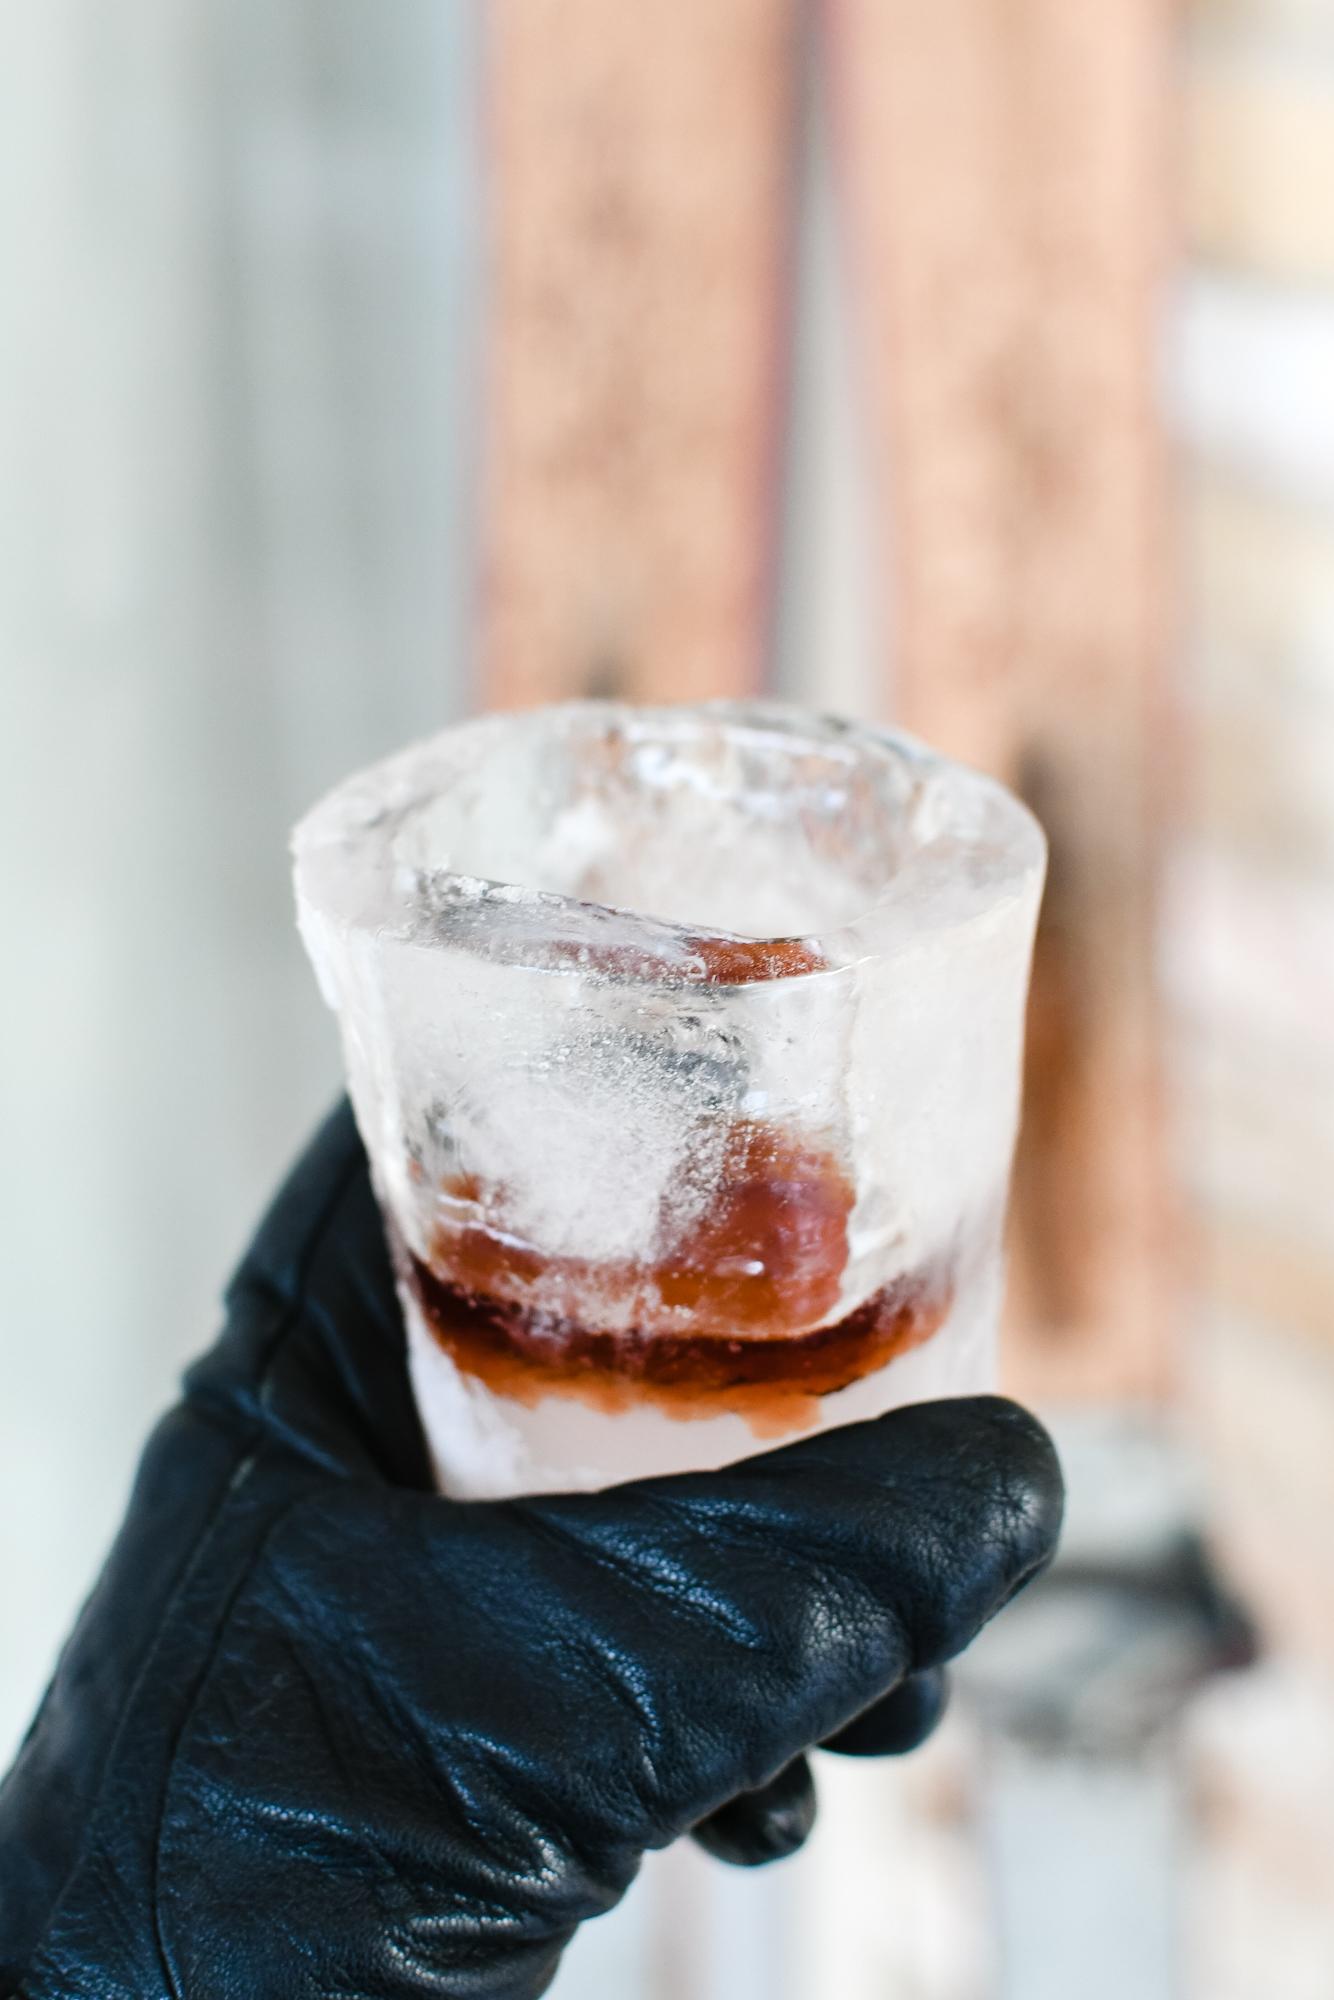 Shotglaasje van ijs